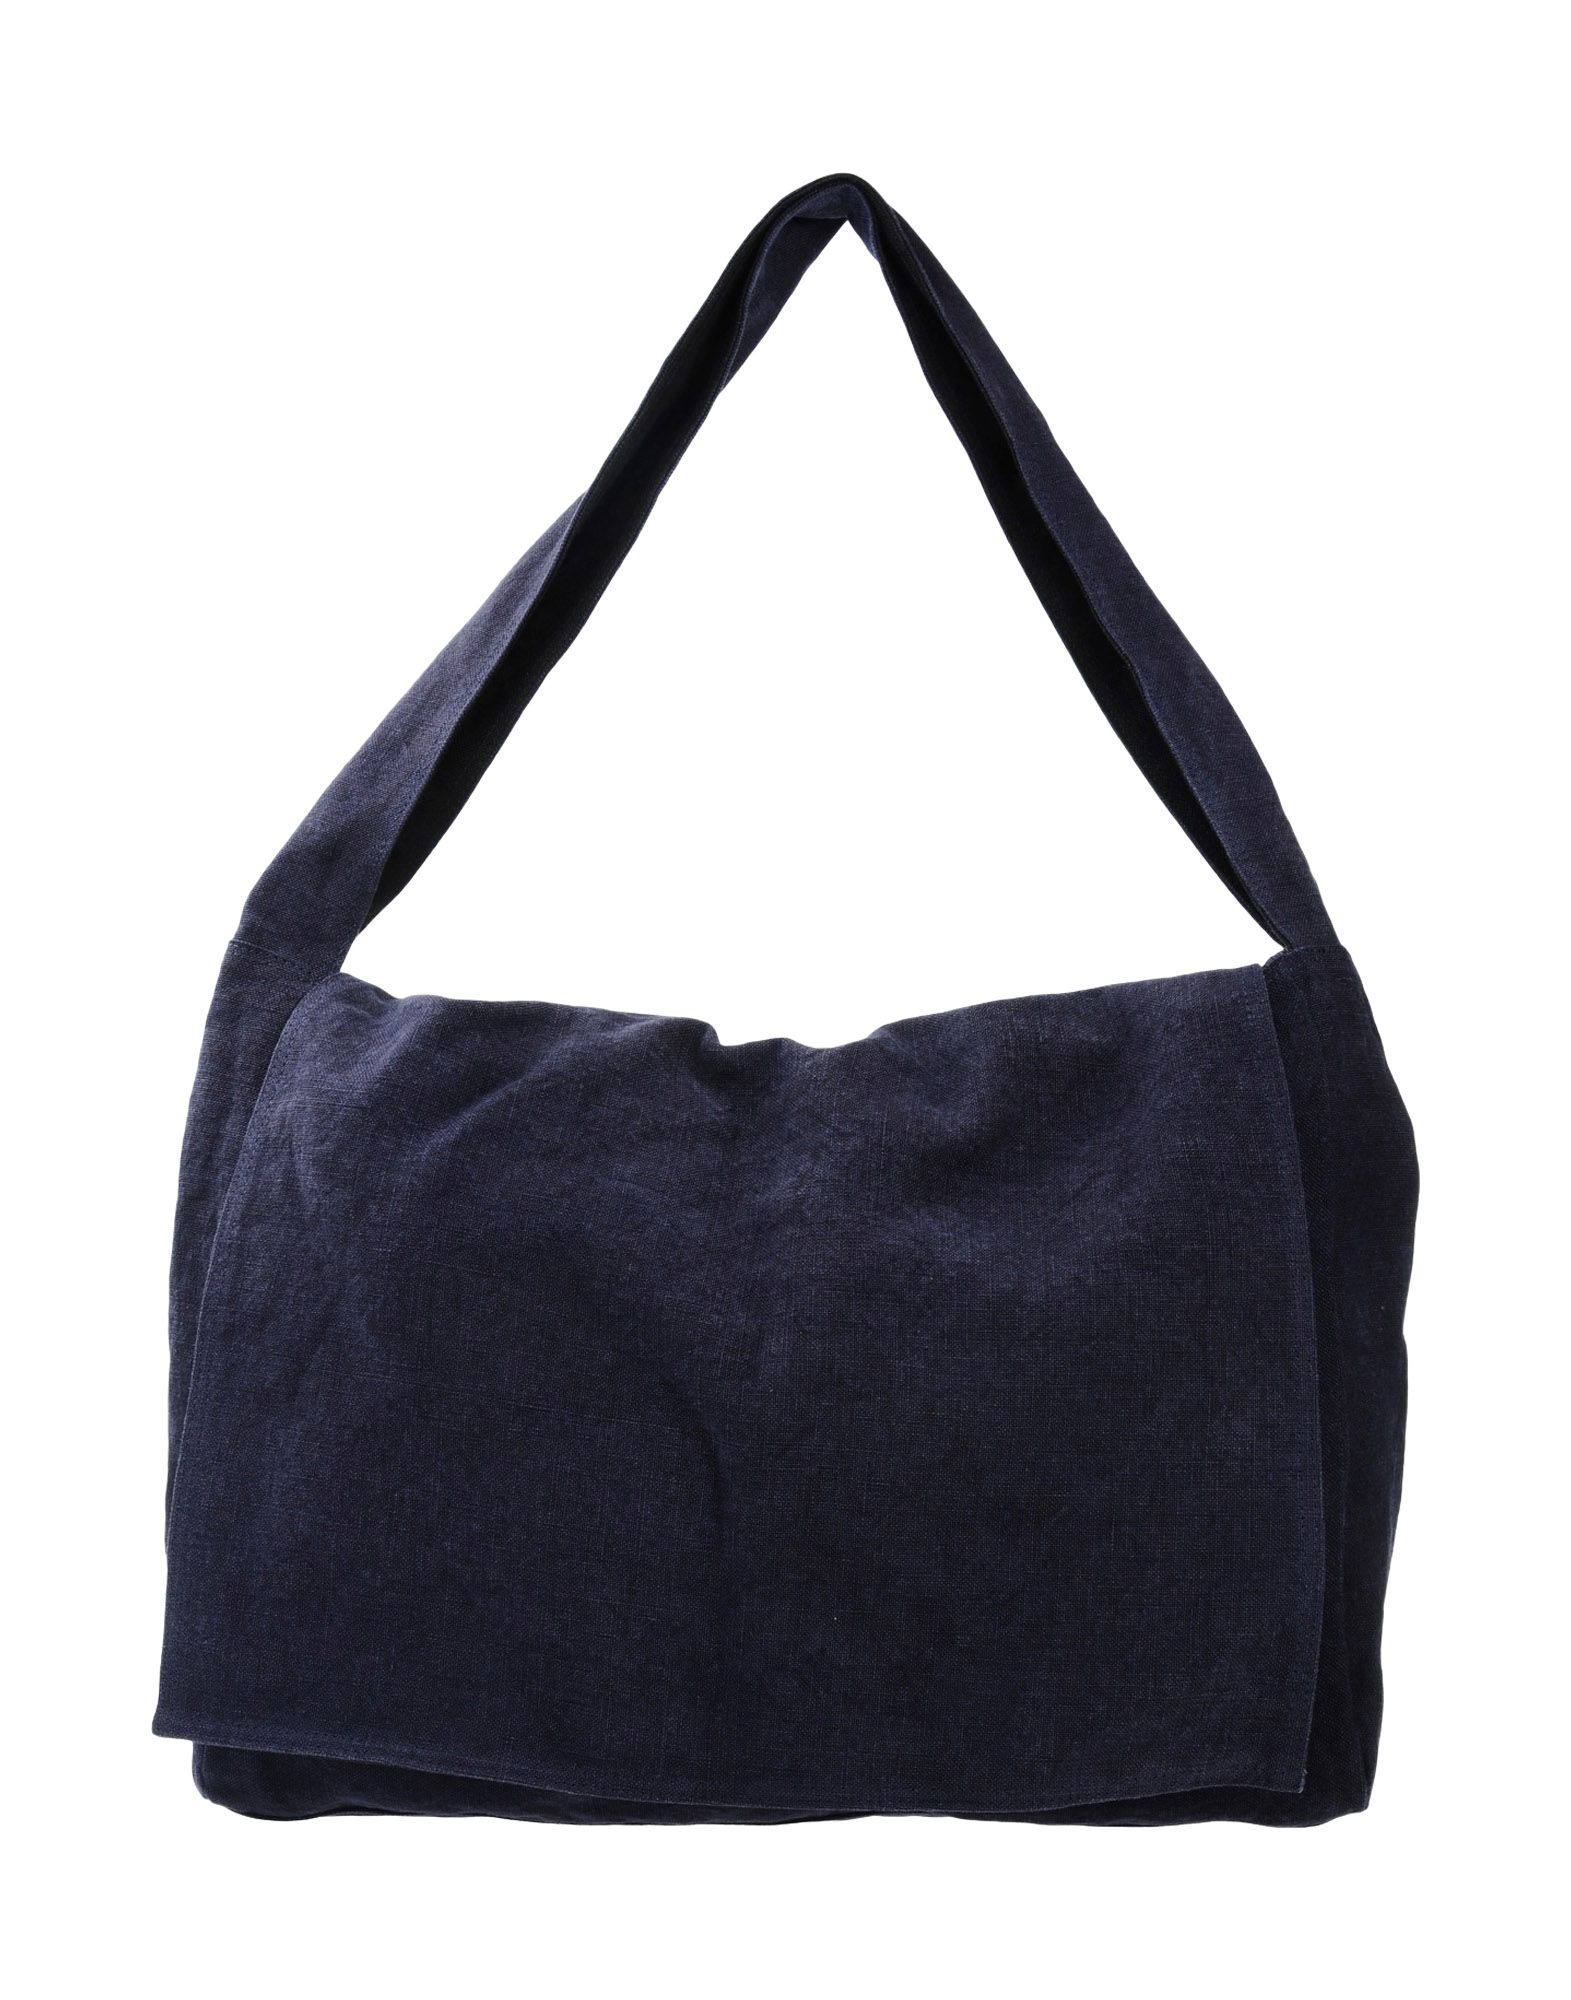 Ballantyne HANDBAGS - Handbags su YOOX.COM qKlMSztRxE